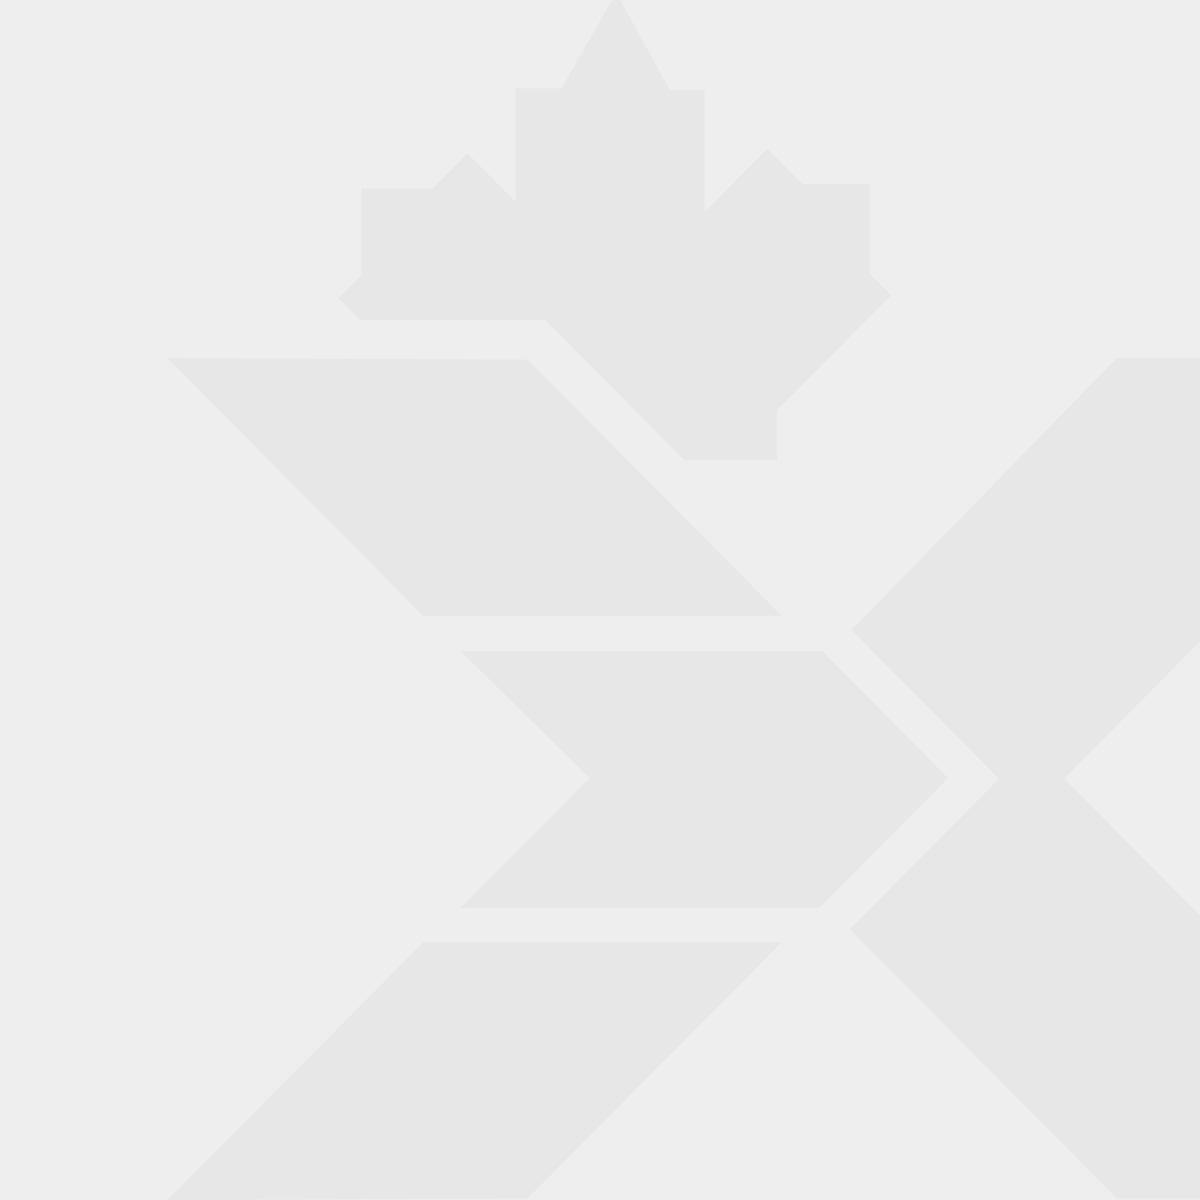 Dyson Humidifier White 303760-01